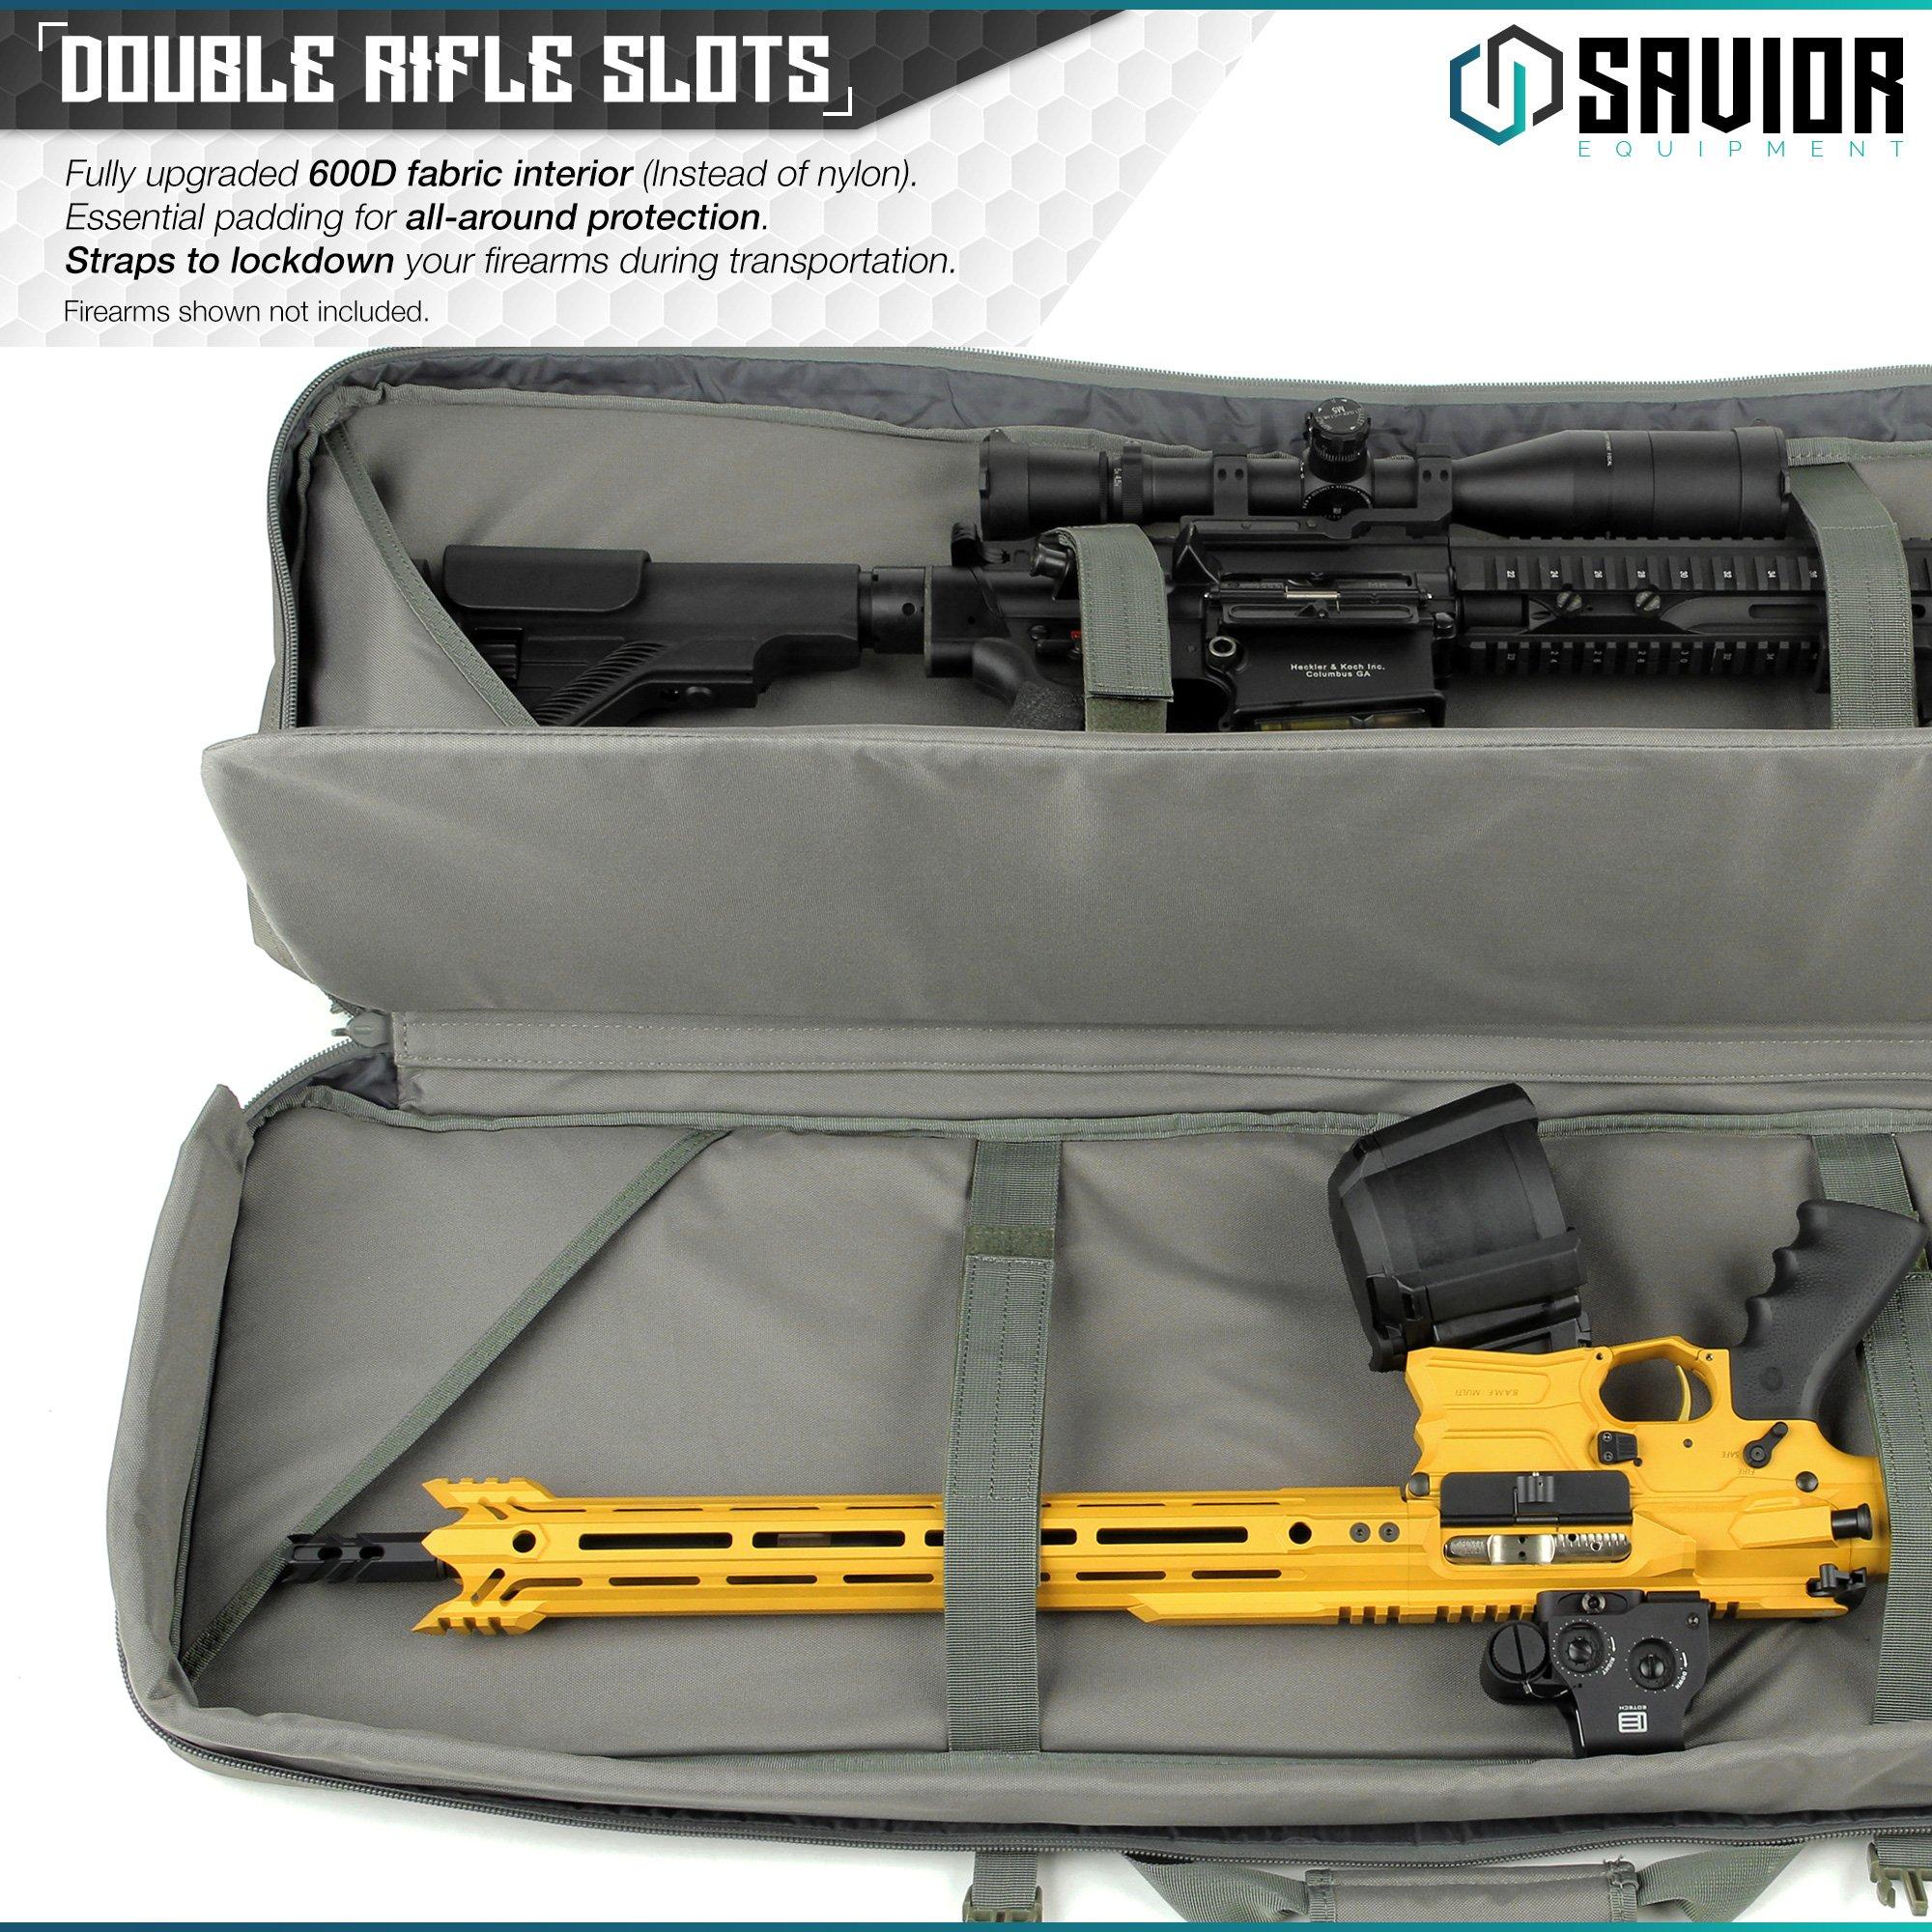 Savior Equipment Urban Warfare Tactical Double Carbine Long Rifle Bag Gun Case Firearm Backpack w/Pistol Handgun Case - 42 Inch Ash Gray by Savior Equipment (Image #2)